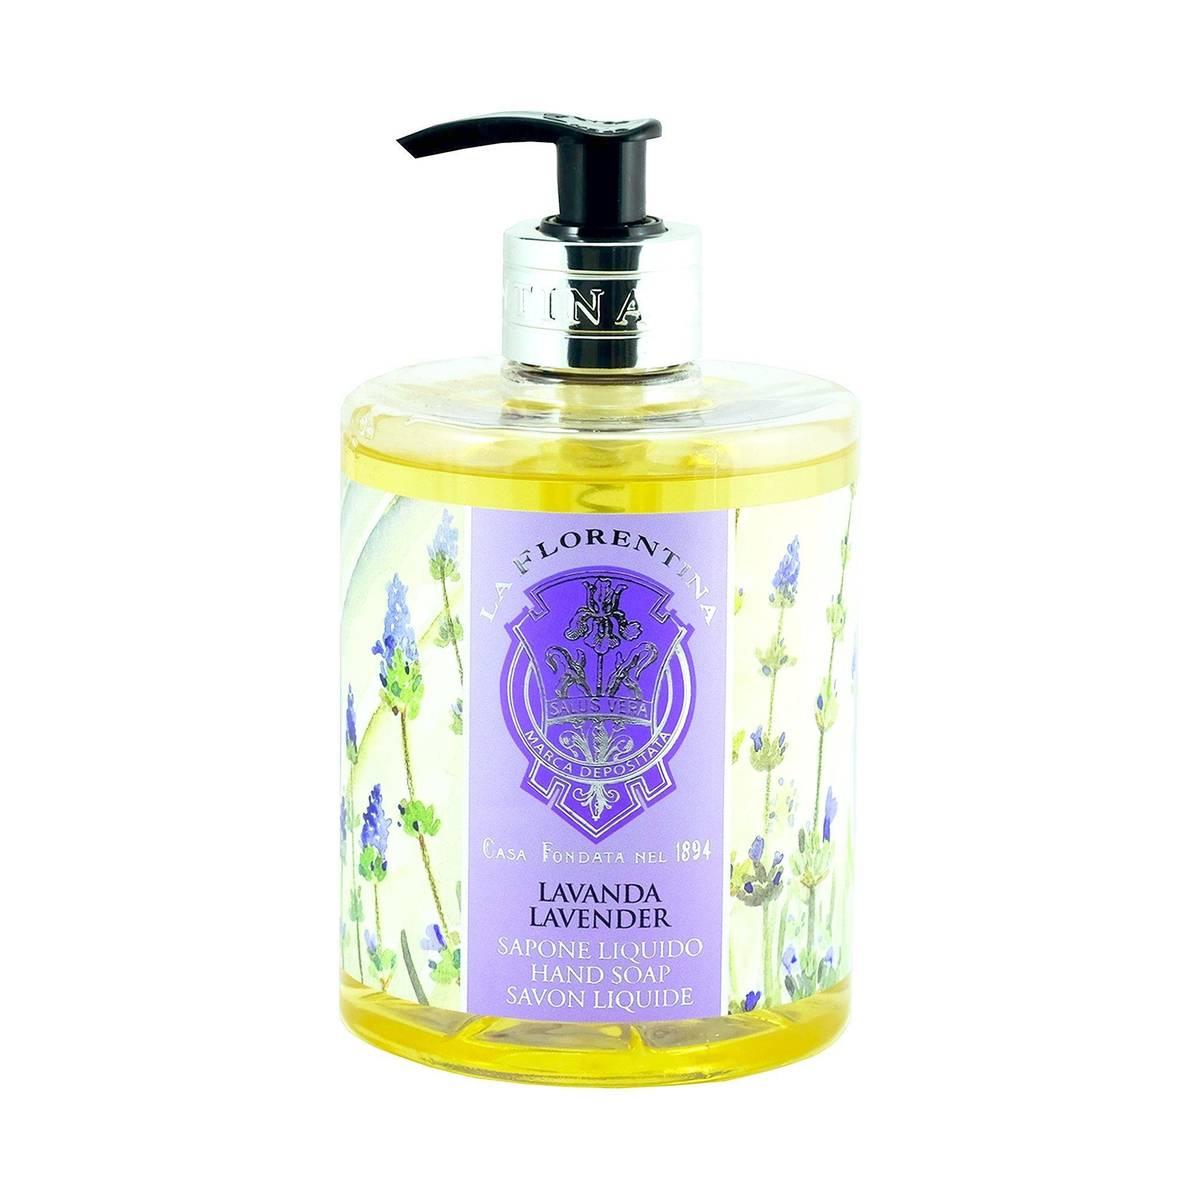 La Florentina Lavender Hand Soap 500 ml